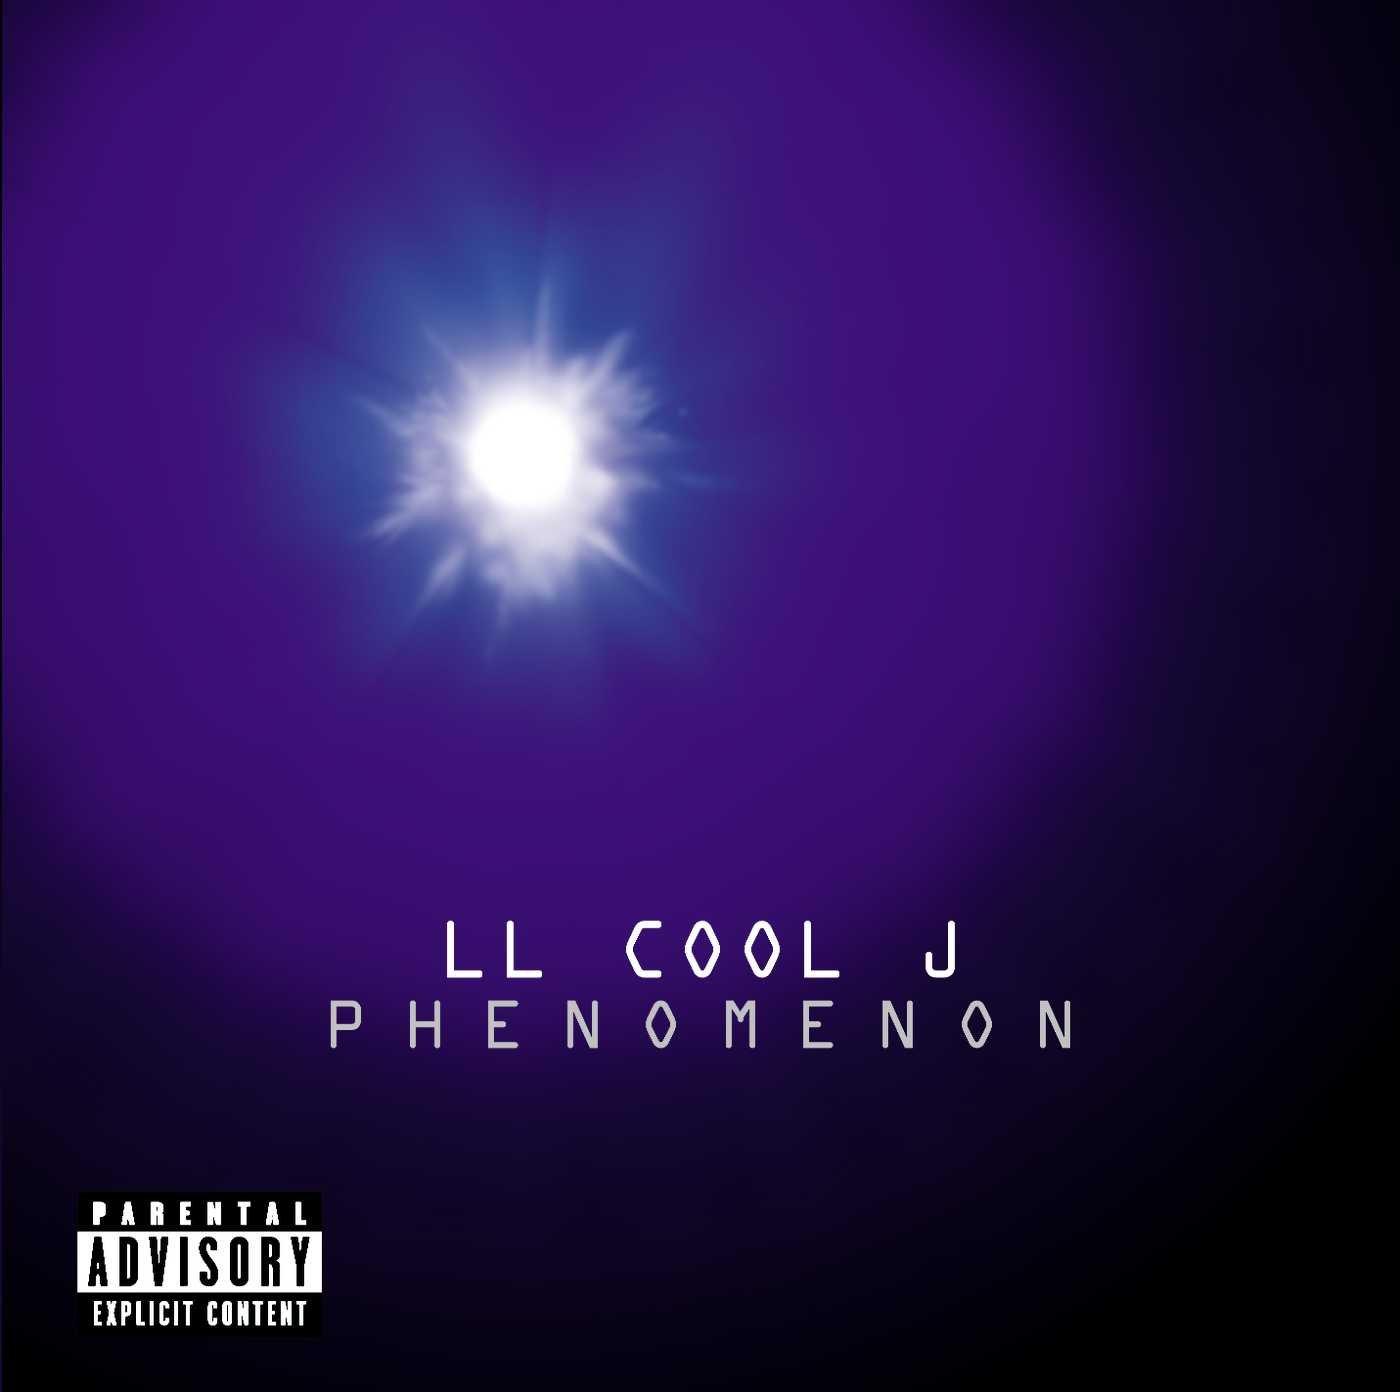 Phenomenon by Universal Int'l